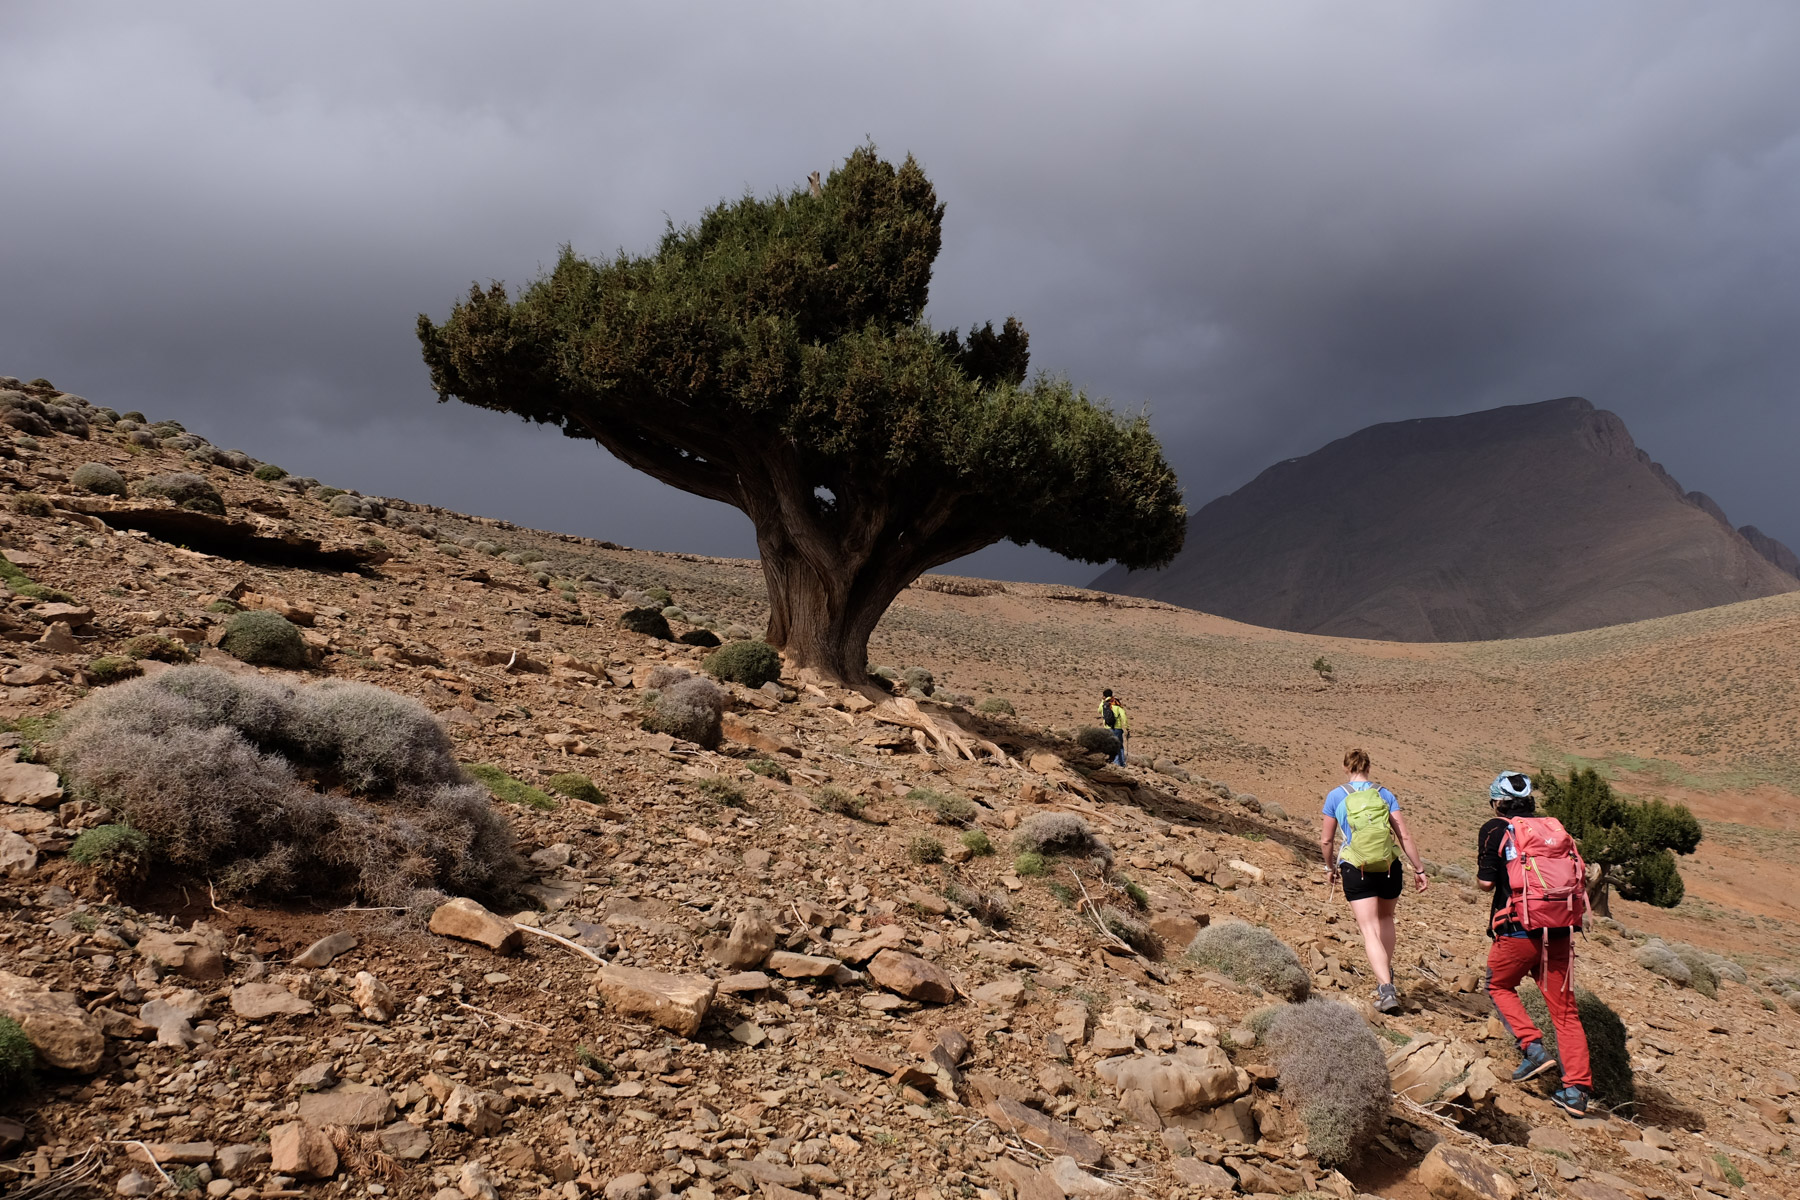 Aroudane, Zaouia Ahansal, Maroc 28